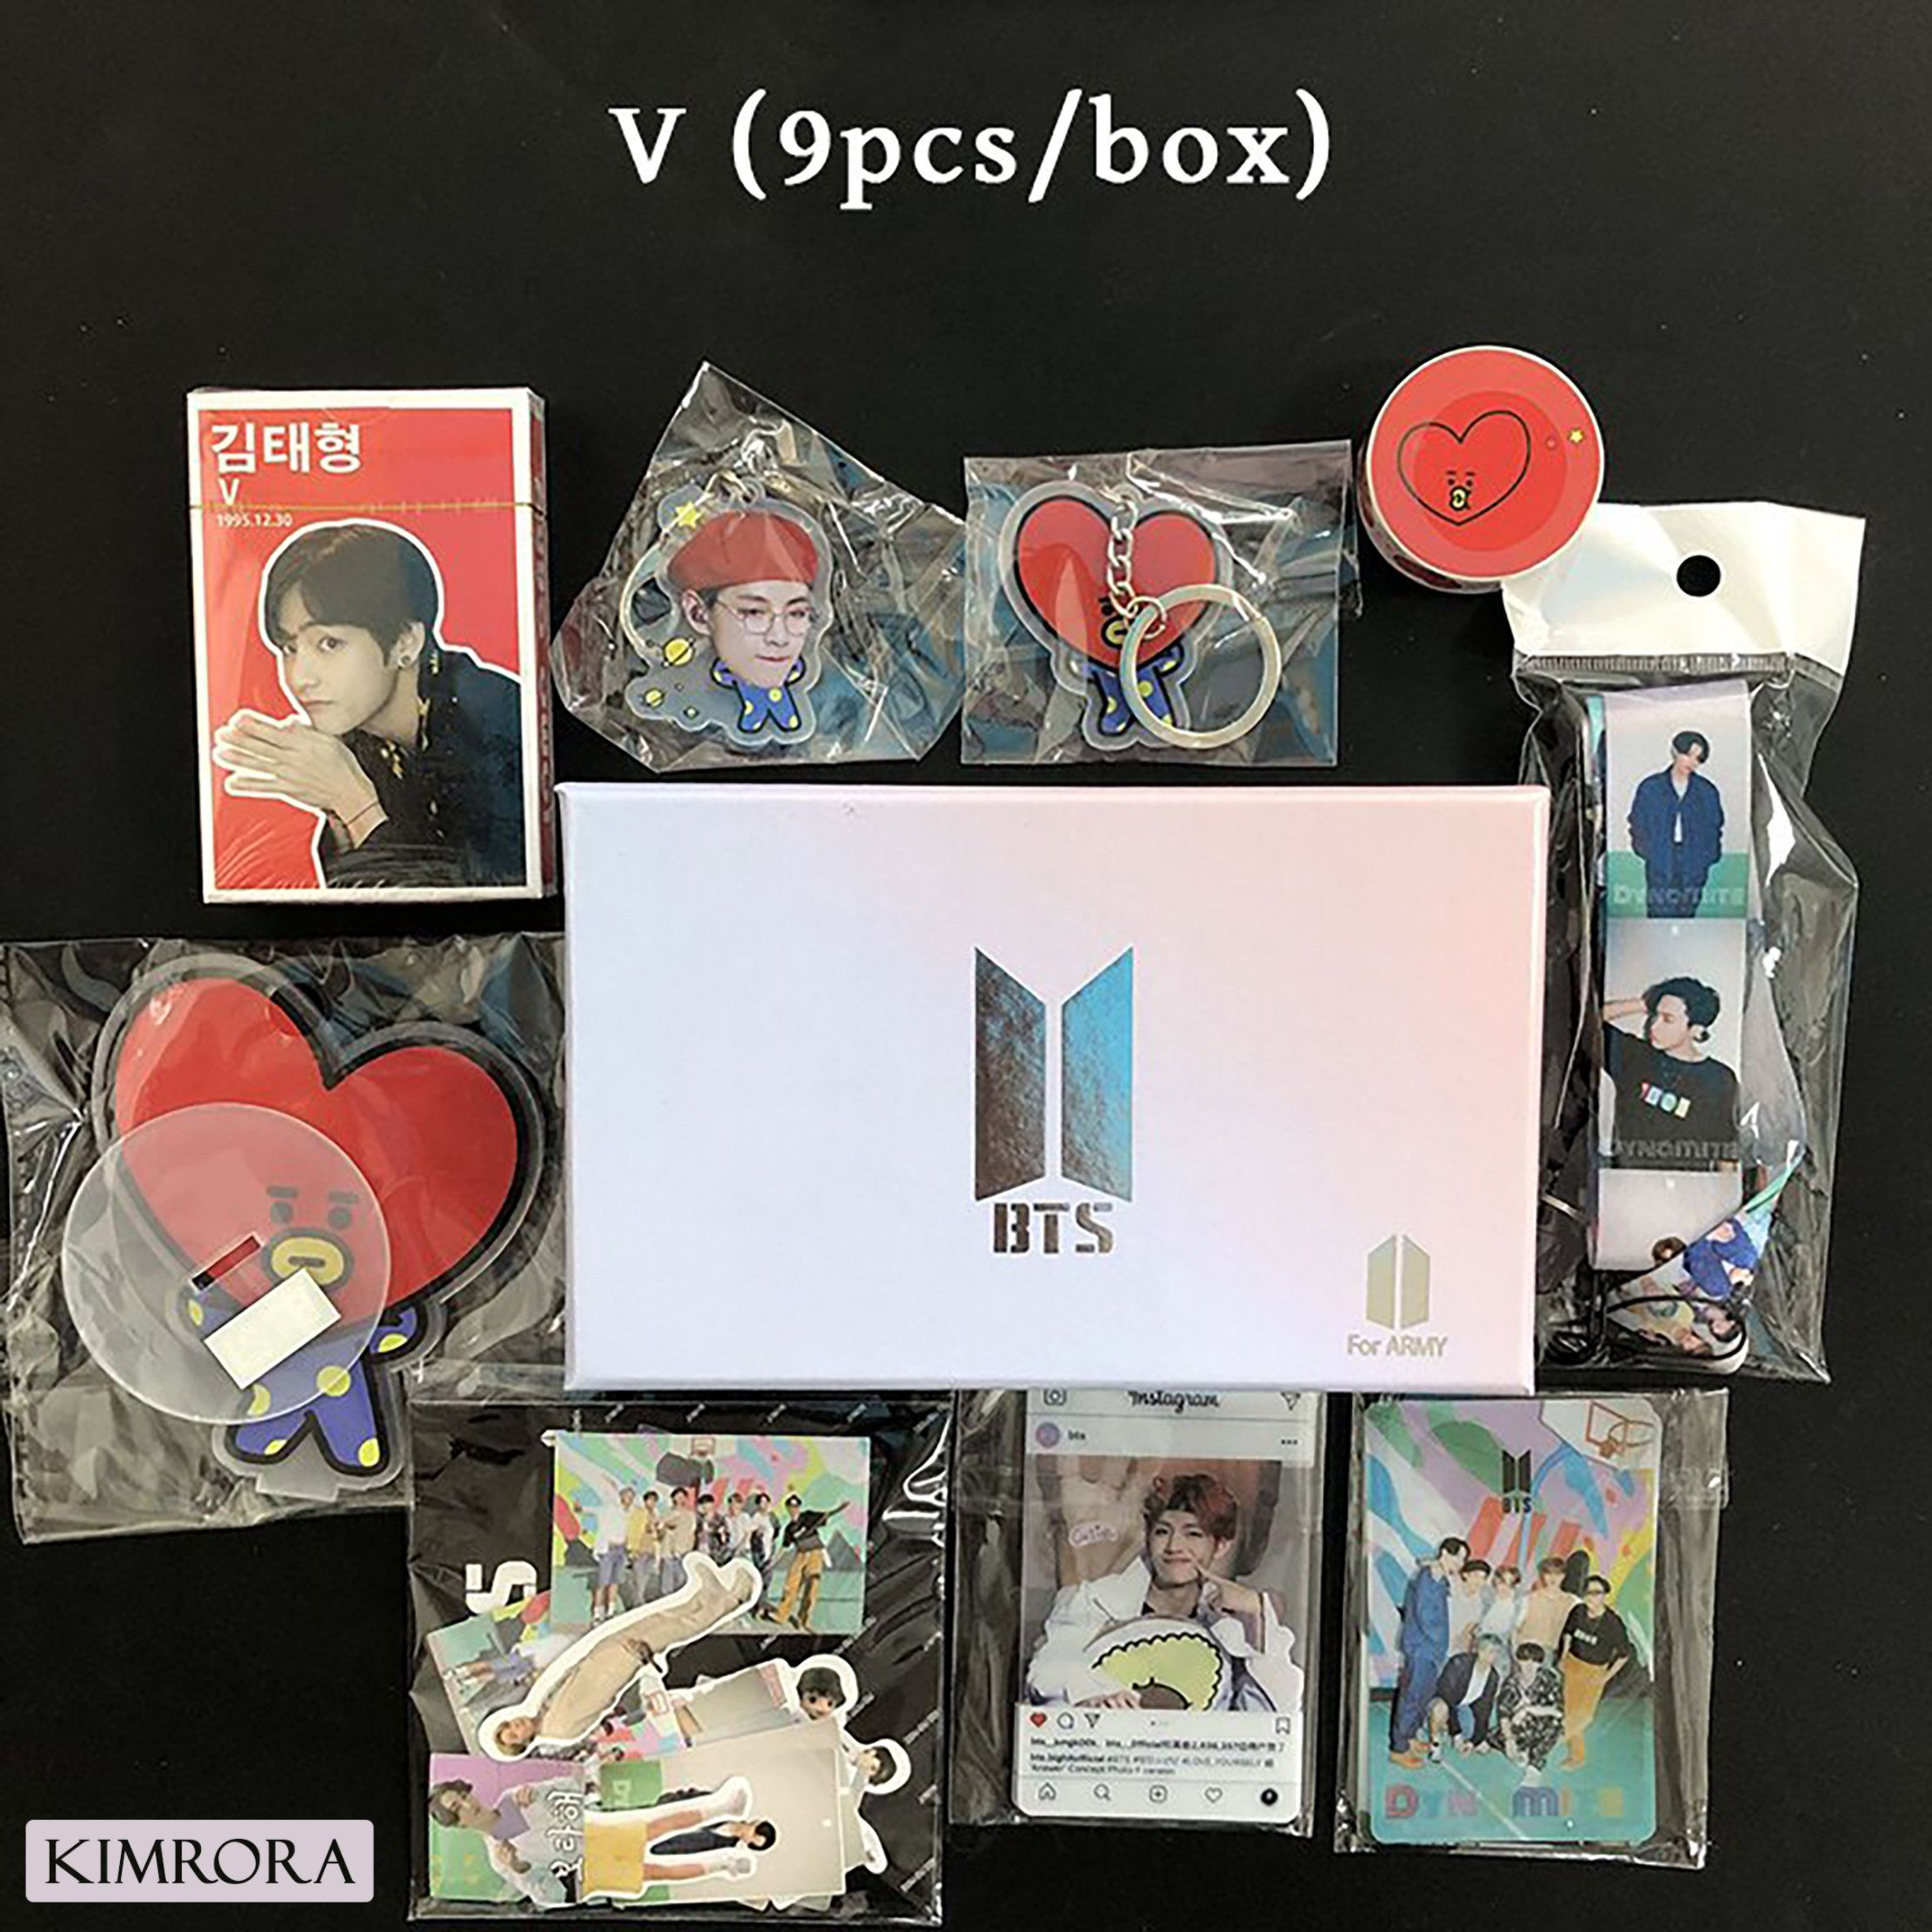 Bts Individual Gift Box Mystery Gift Box Subscription Box Etsy In 2020 Gift Subscription Boxes Bts Surprise Box Gift